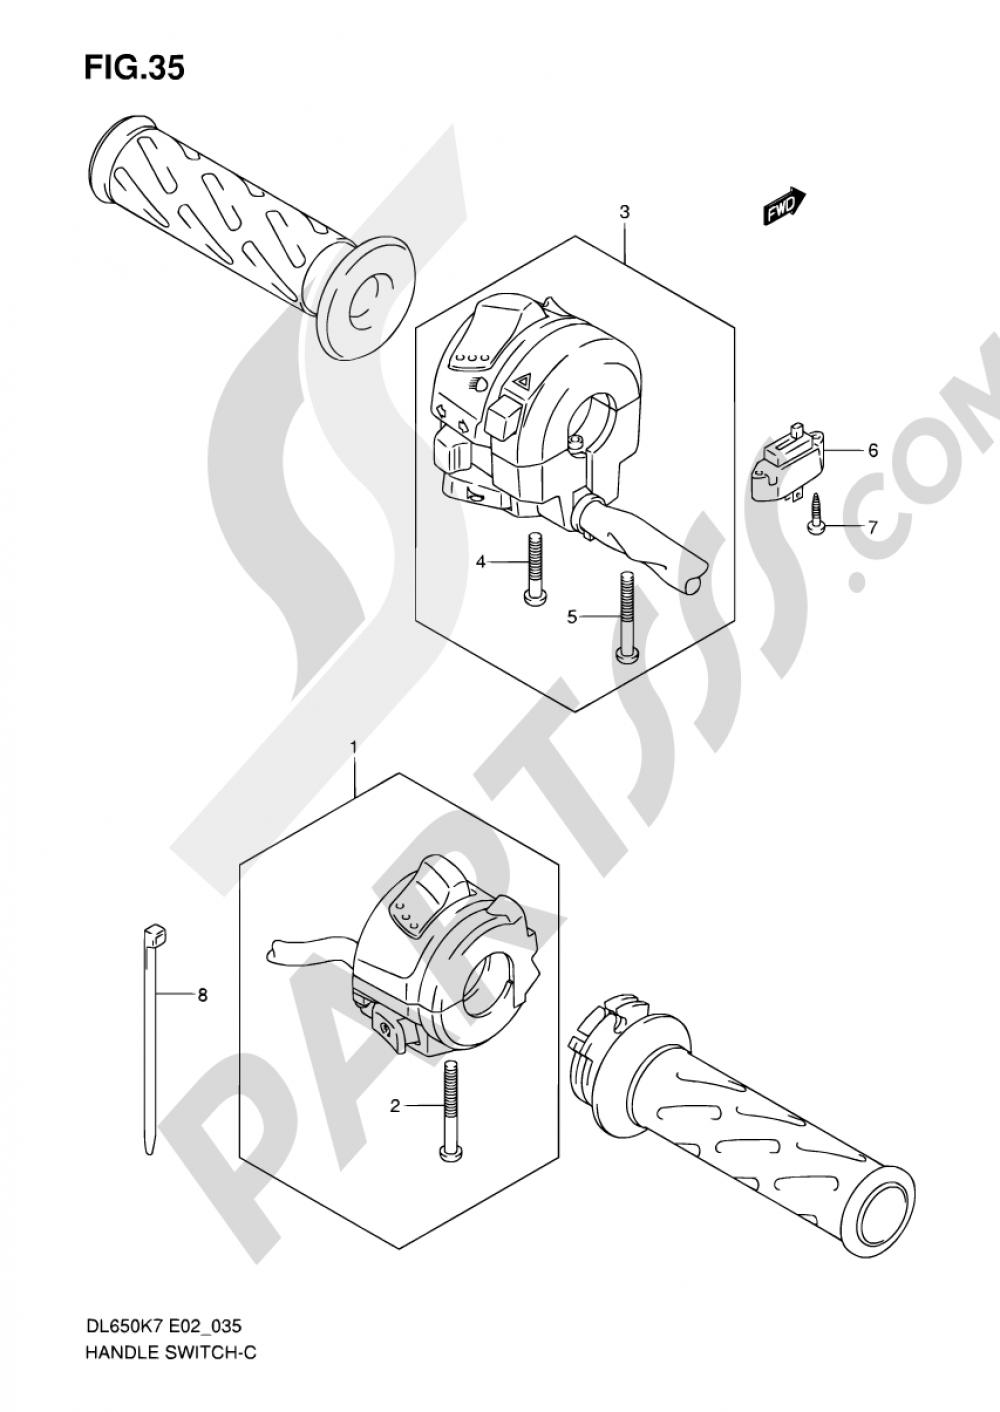 35 - HANDLE SWITCH (MODEL K7/K8/K9 E02/E19/E24) Suzuki VSTROM DL650A 2009